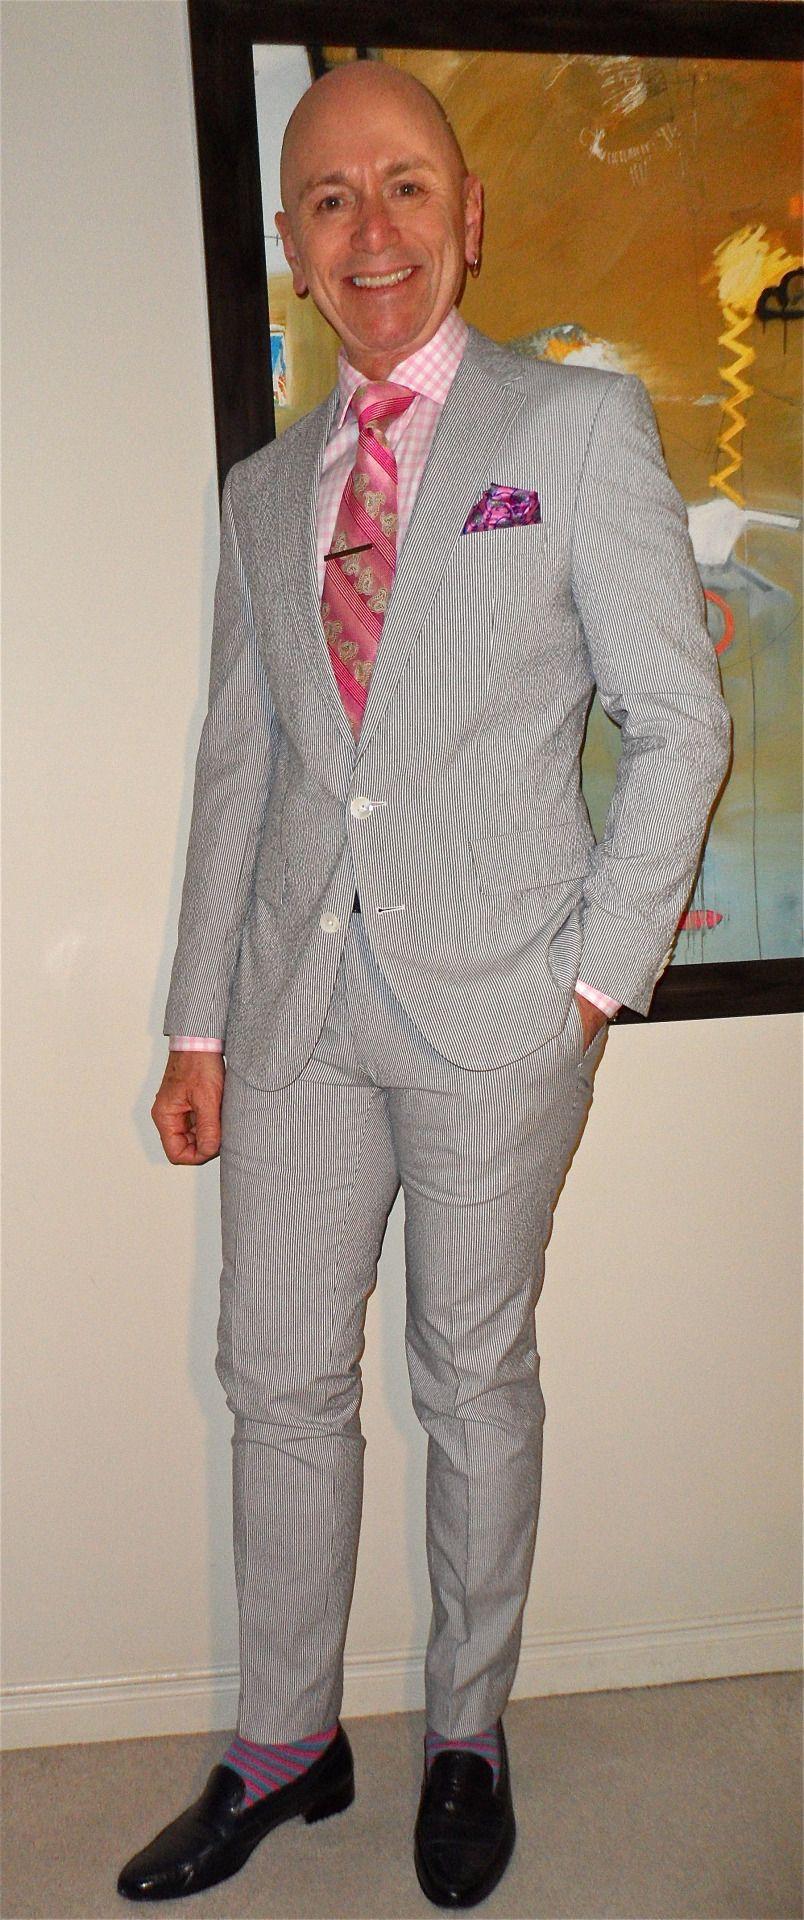 249729f4884 Hugo Boss seersucker suit, Tommy Hilfiger shirt, Ted Baker tie, Deerskin  Trading…